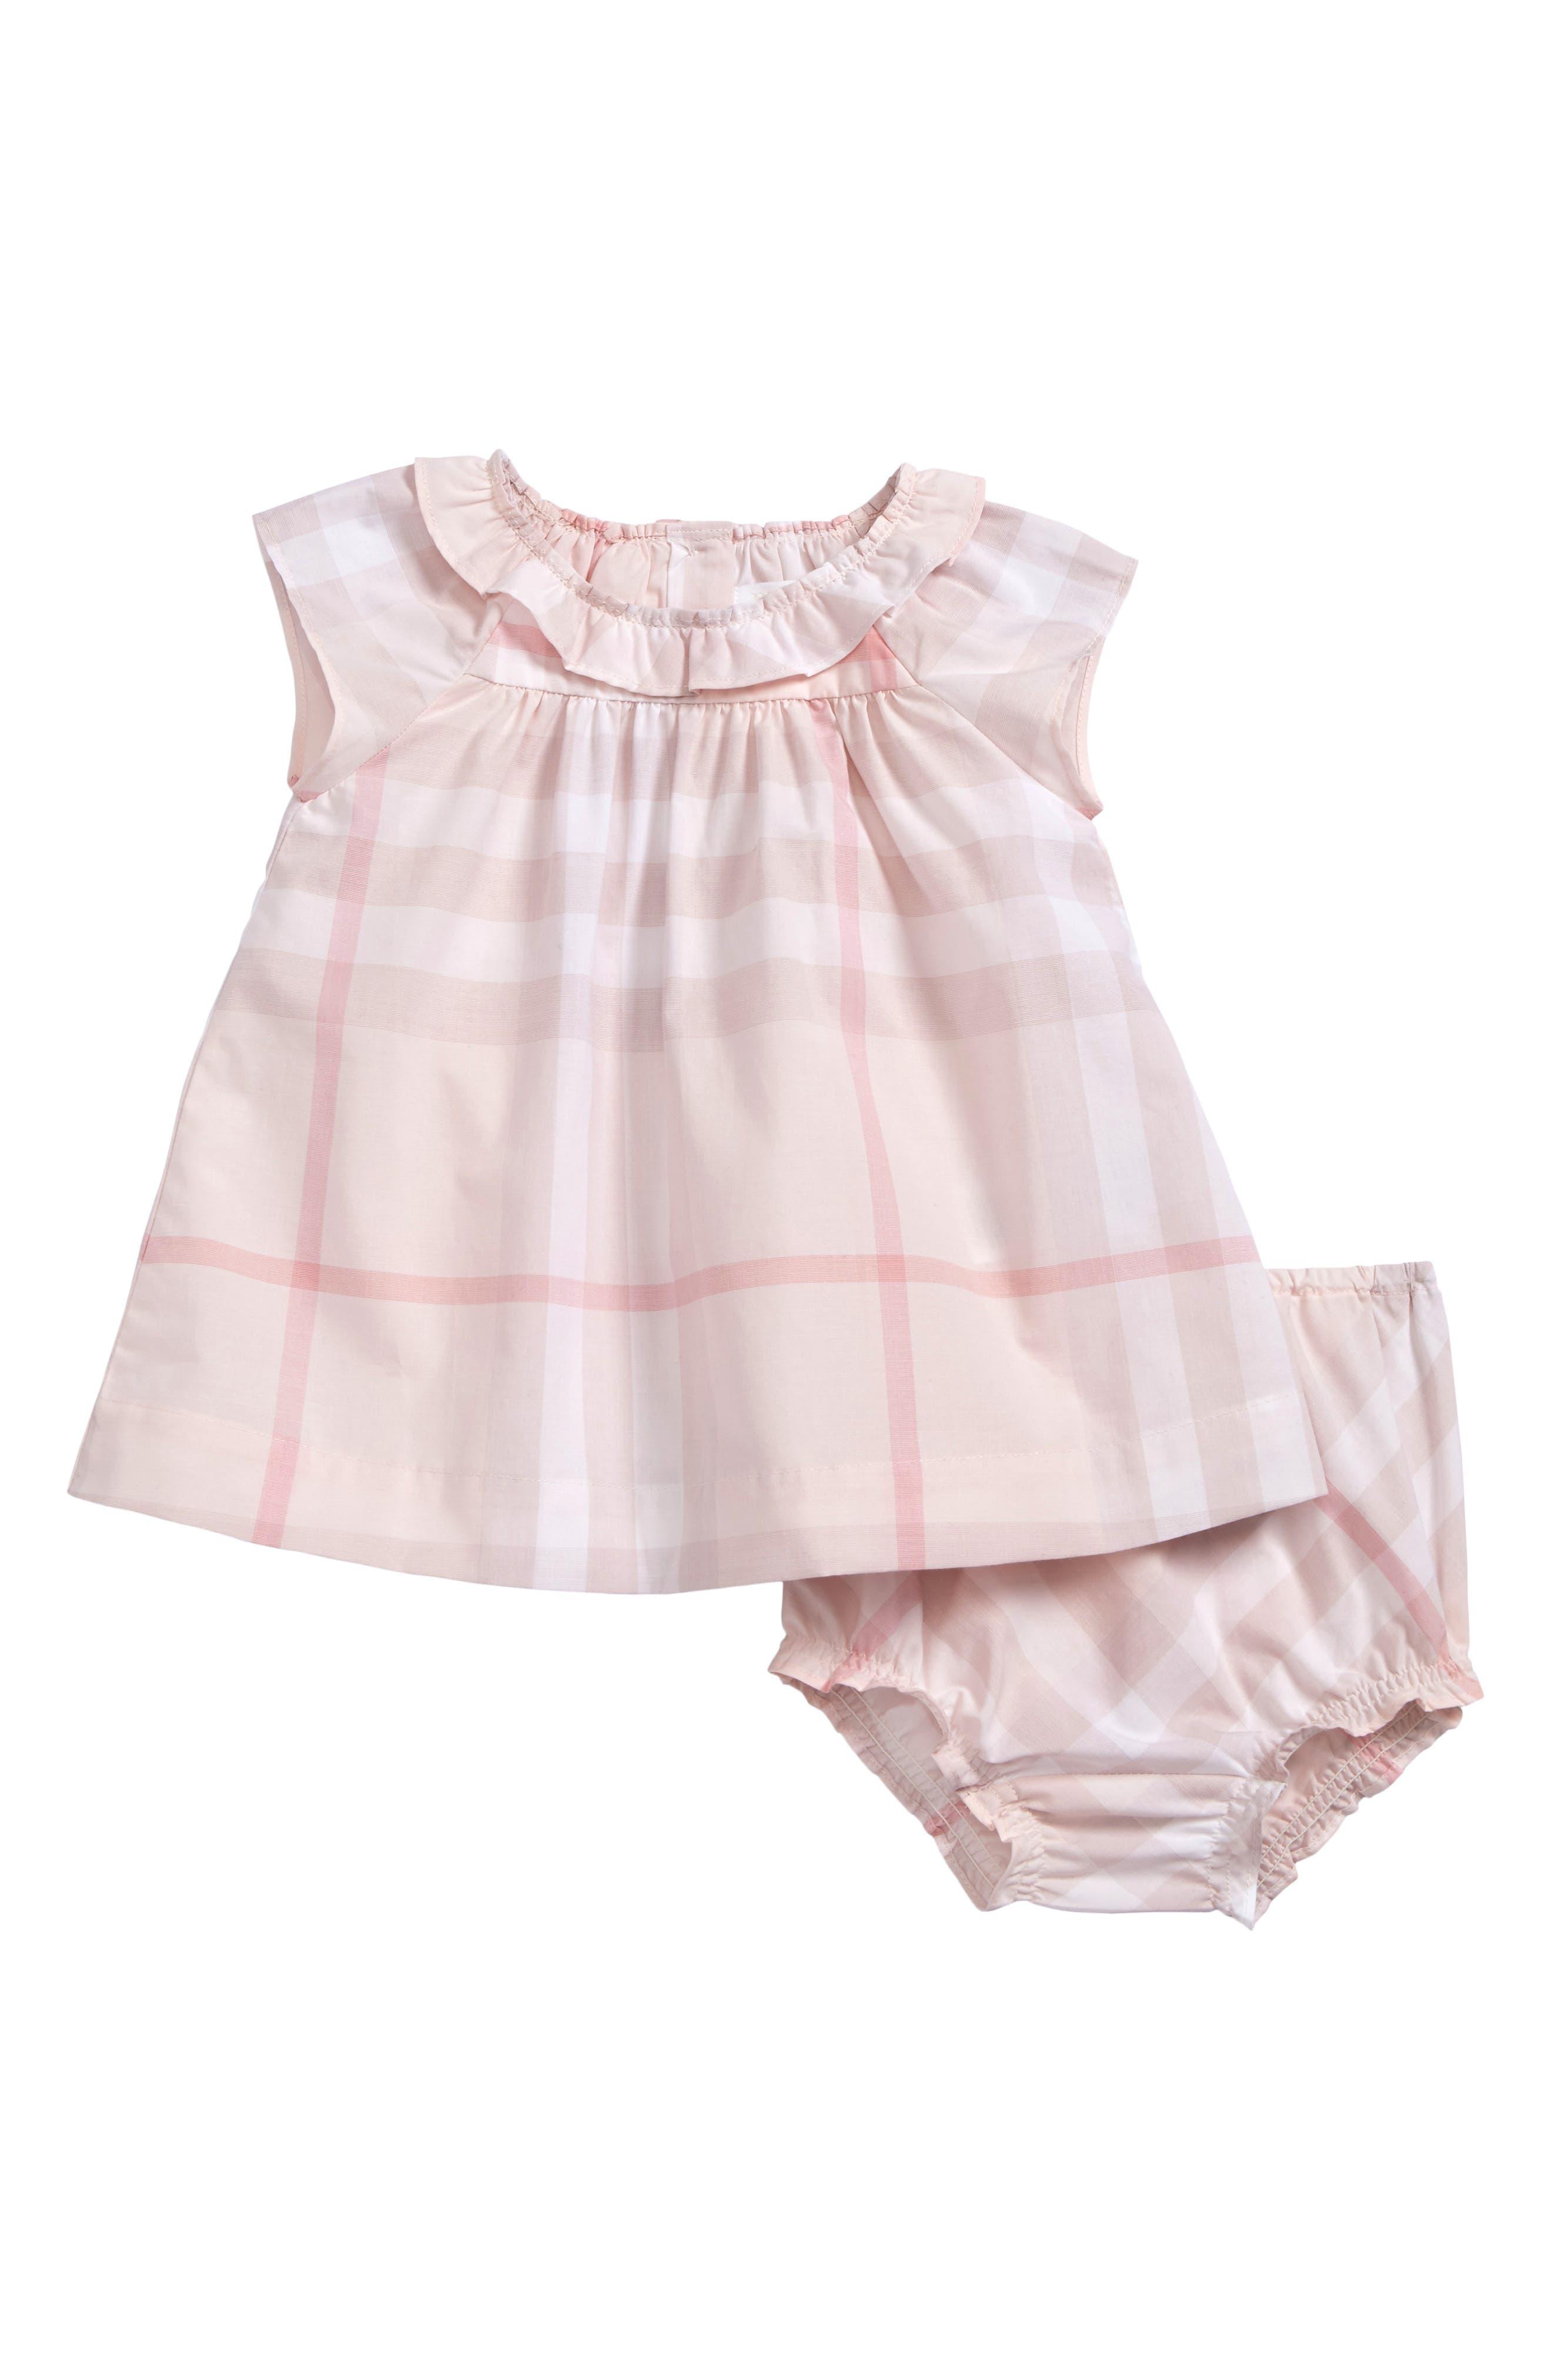 Main Image - Burberry Emerald Check Print Dress (Baby Girls)